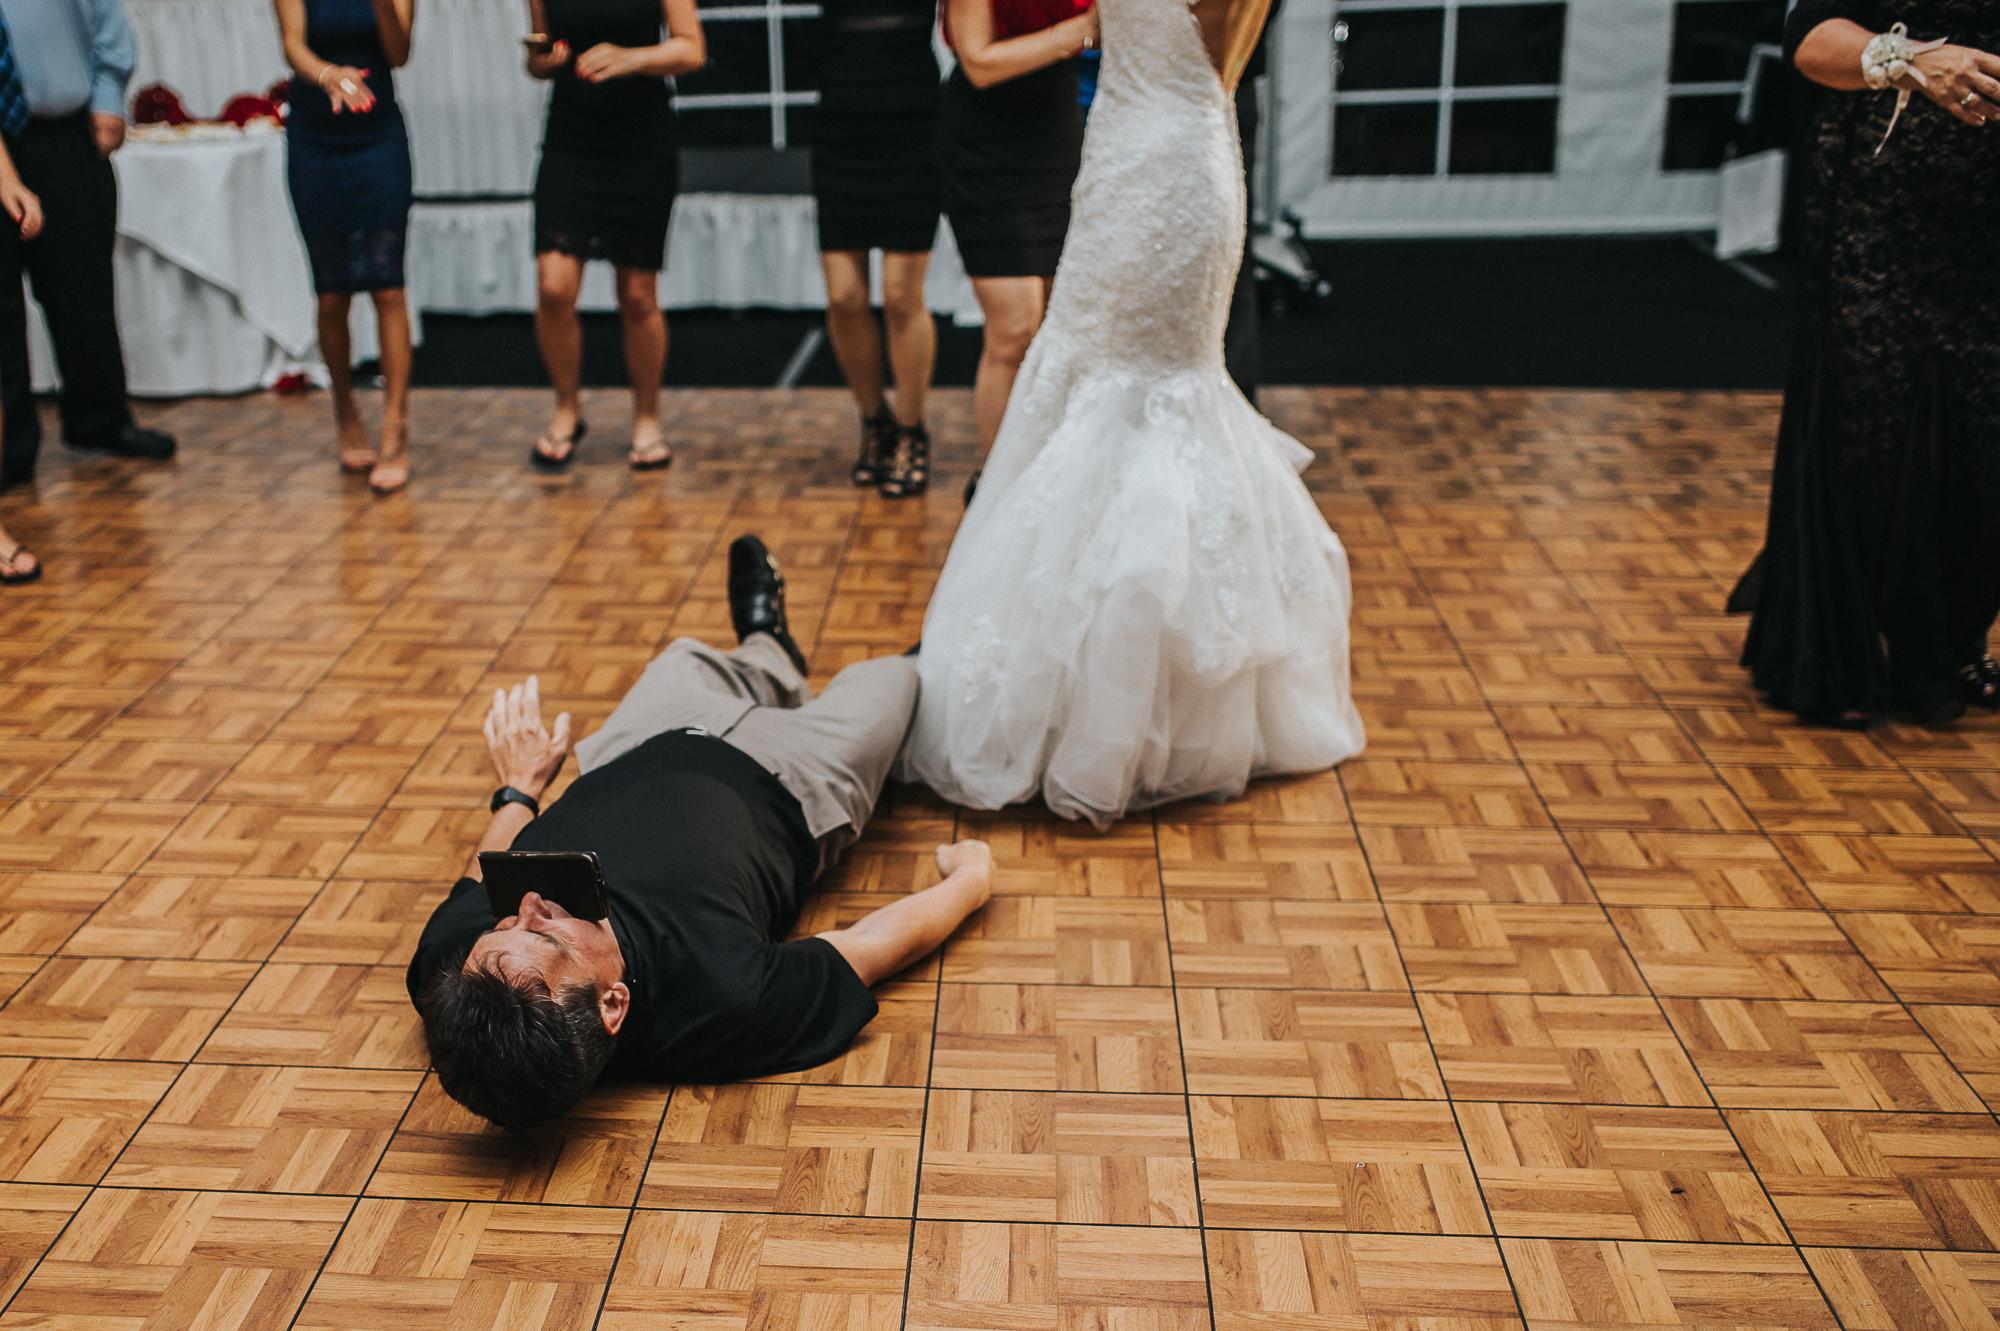 Christina-and-Gene-Wedding-Marla-Rain-Photography-630.jpg